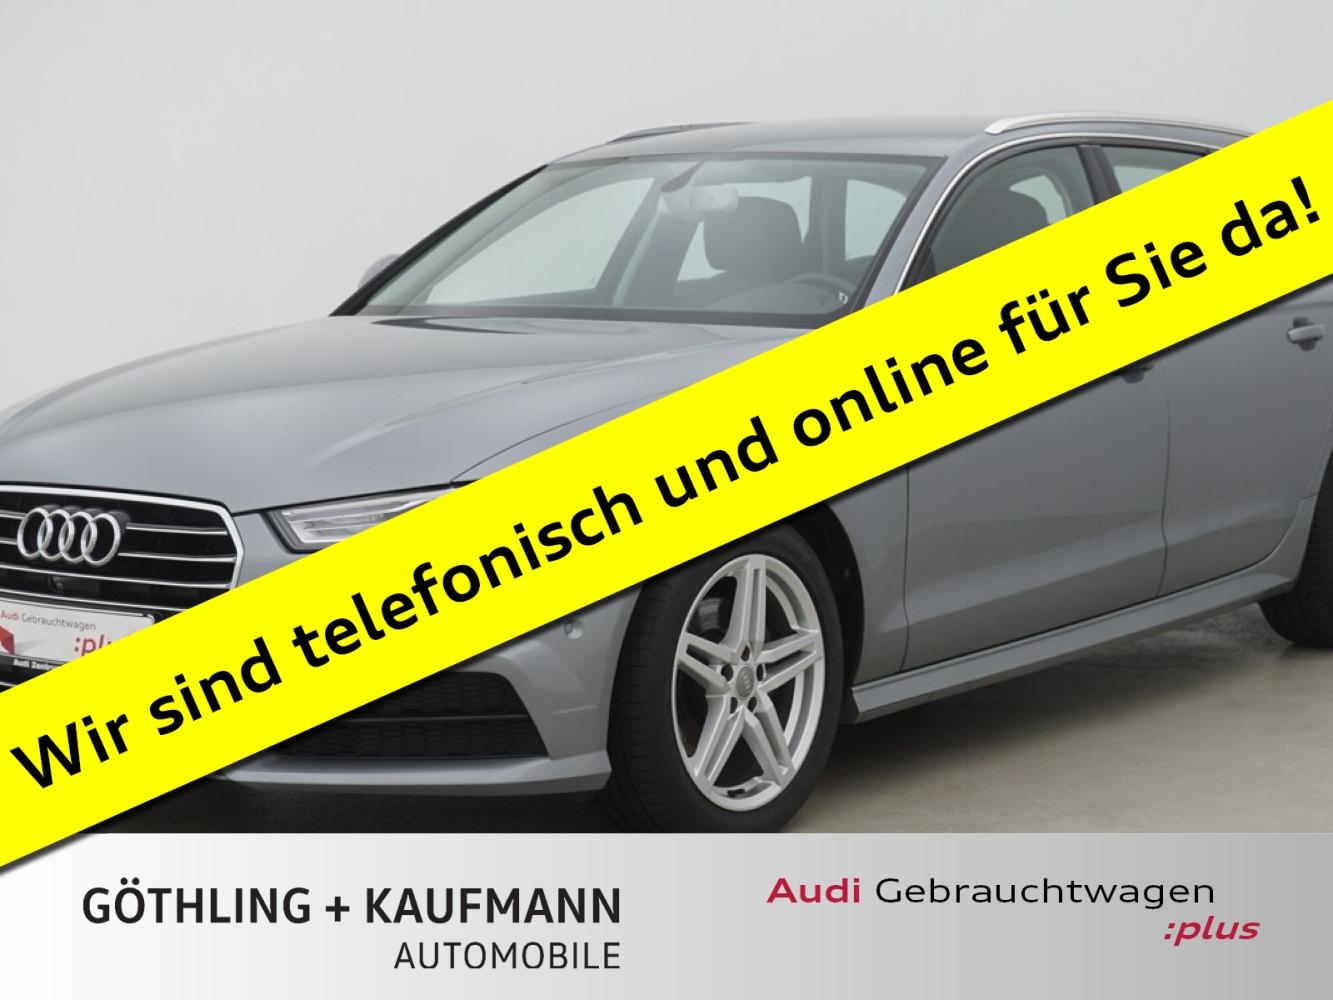 Audi A6 Avant 2.0 TDI qu S tro. 140kW*Kamera*Leder*ph, Jahr 2017, Diesel